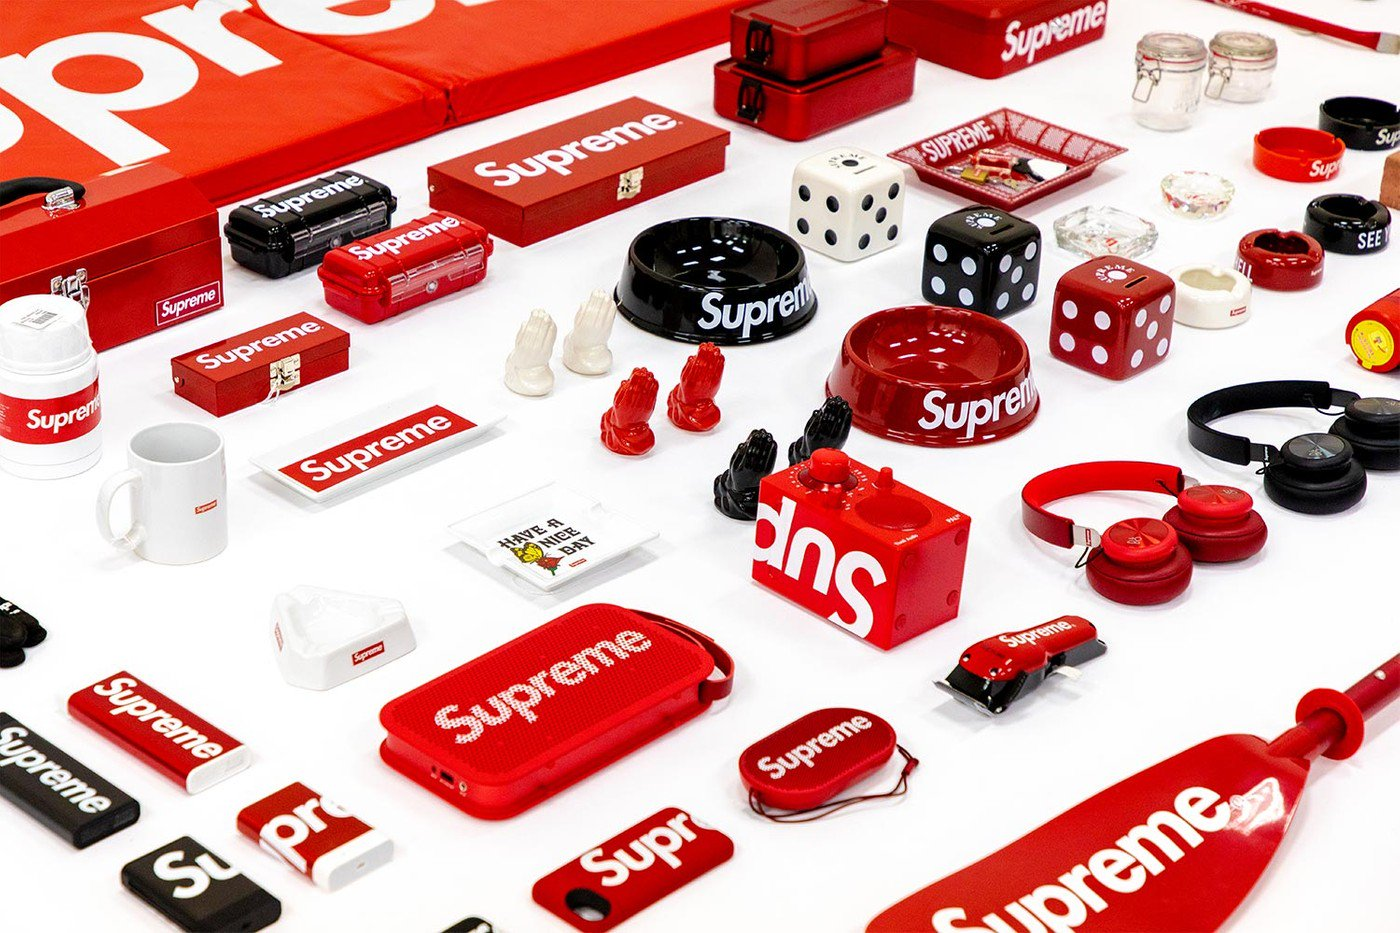 https___hypebeast.com_image_2019_05_sothebys-supreme-accessories-auction-002